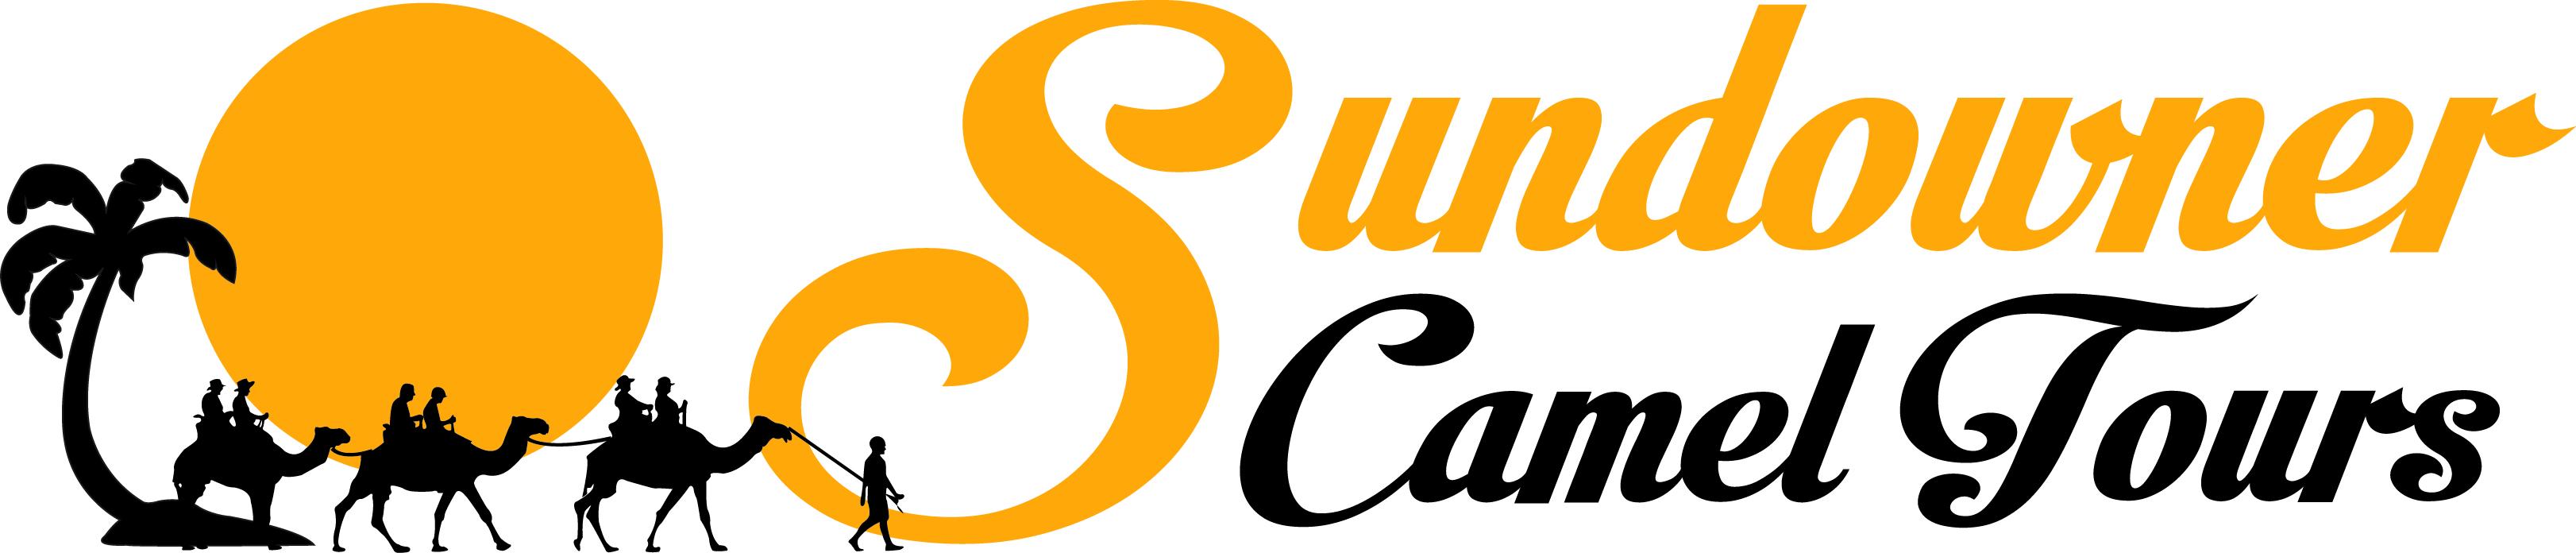 Sundowner Camel Tours Broome, Cable Beach WA.